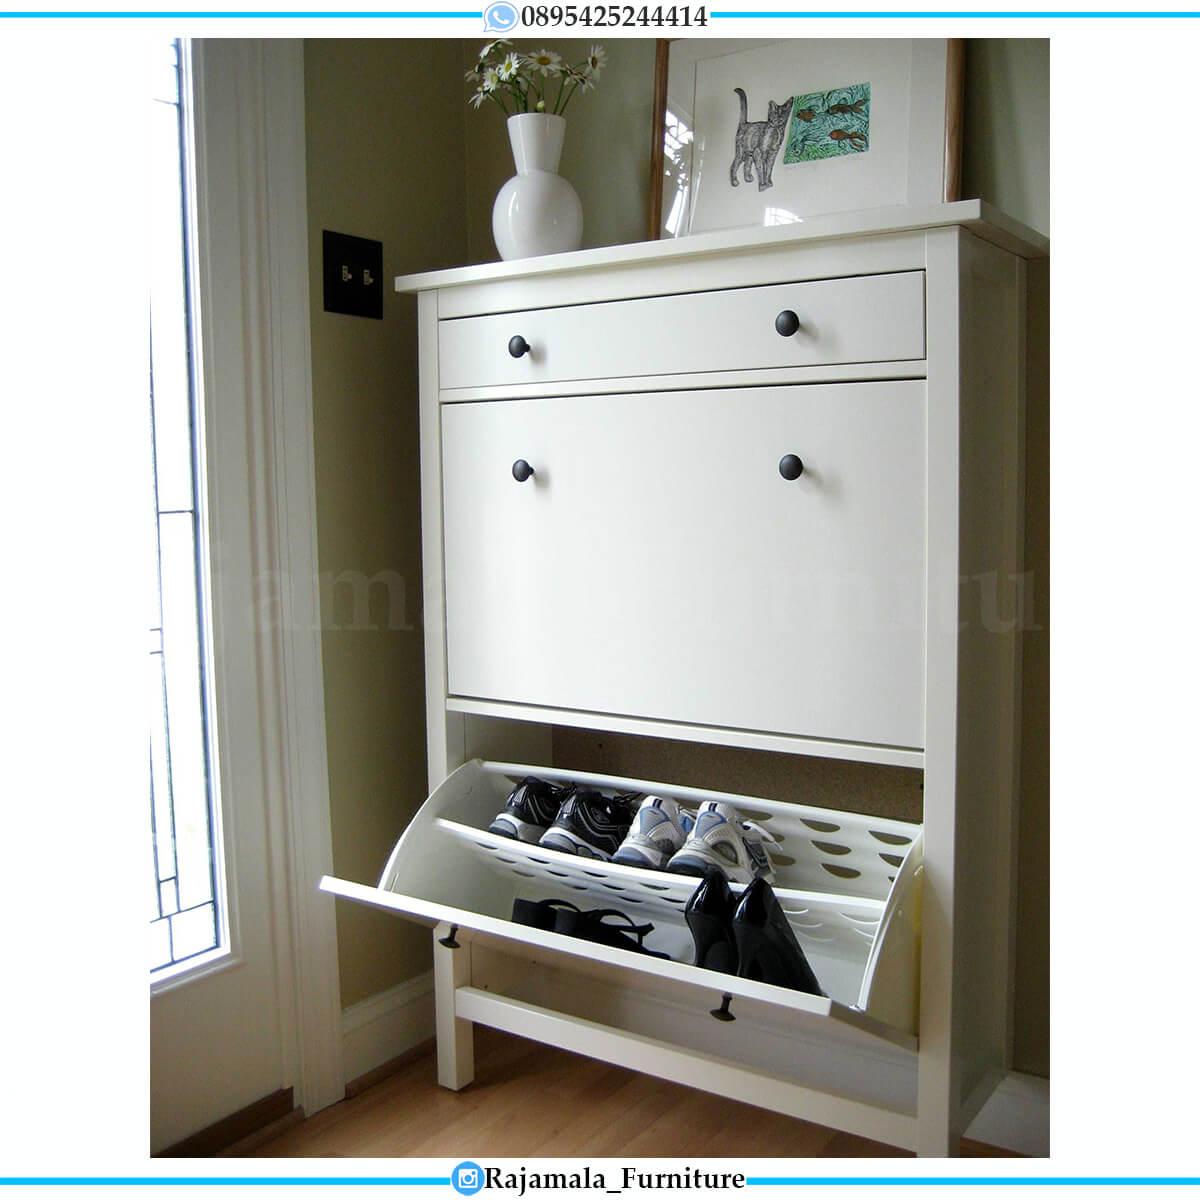 Tempat Sepatu Minimalis Putih Duco Luxury Modern Design RM-0562